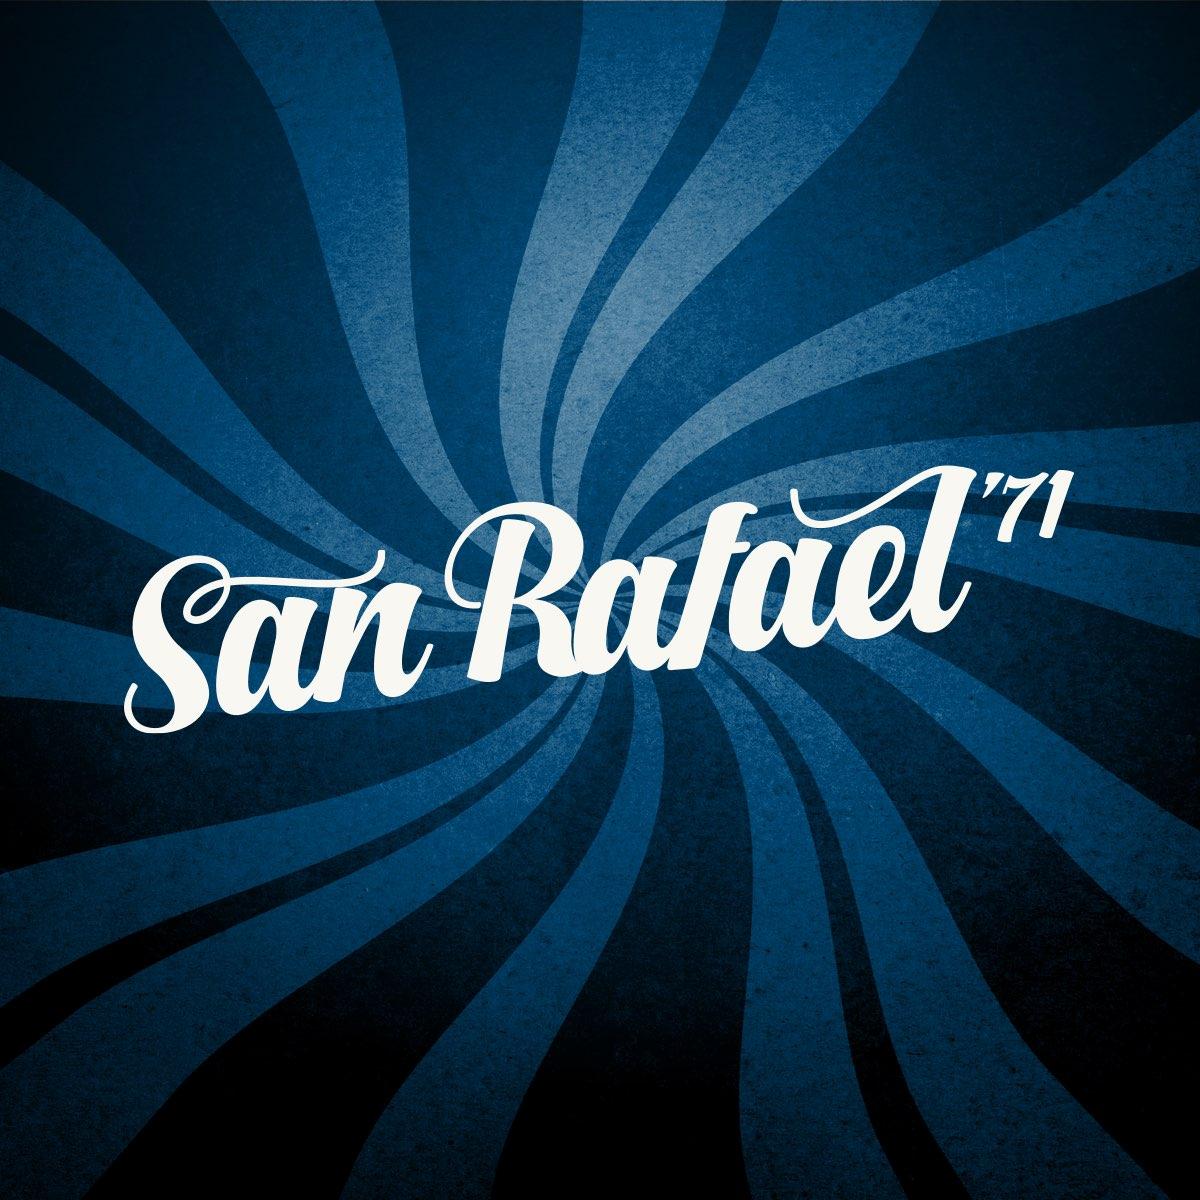 San Rafael '71 Cannabis